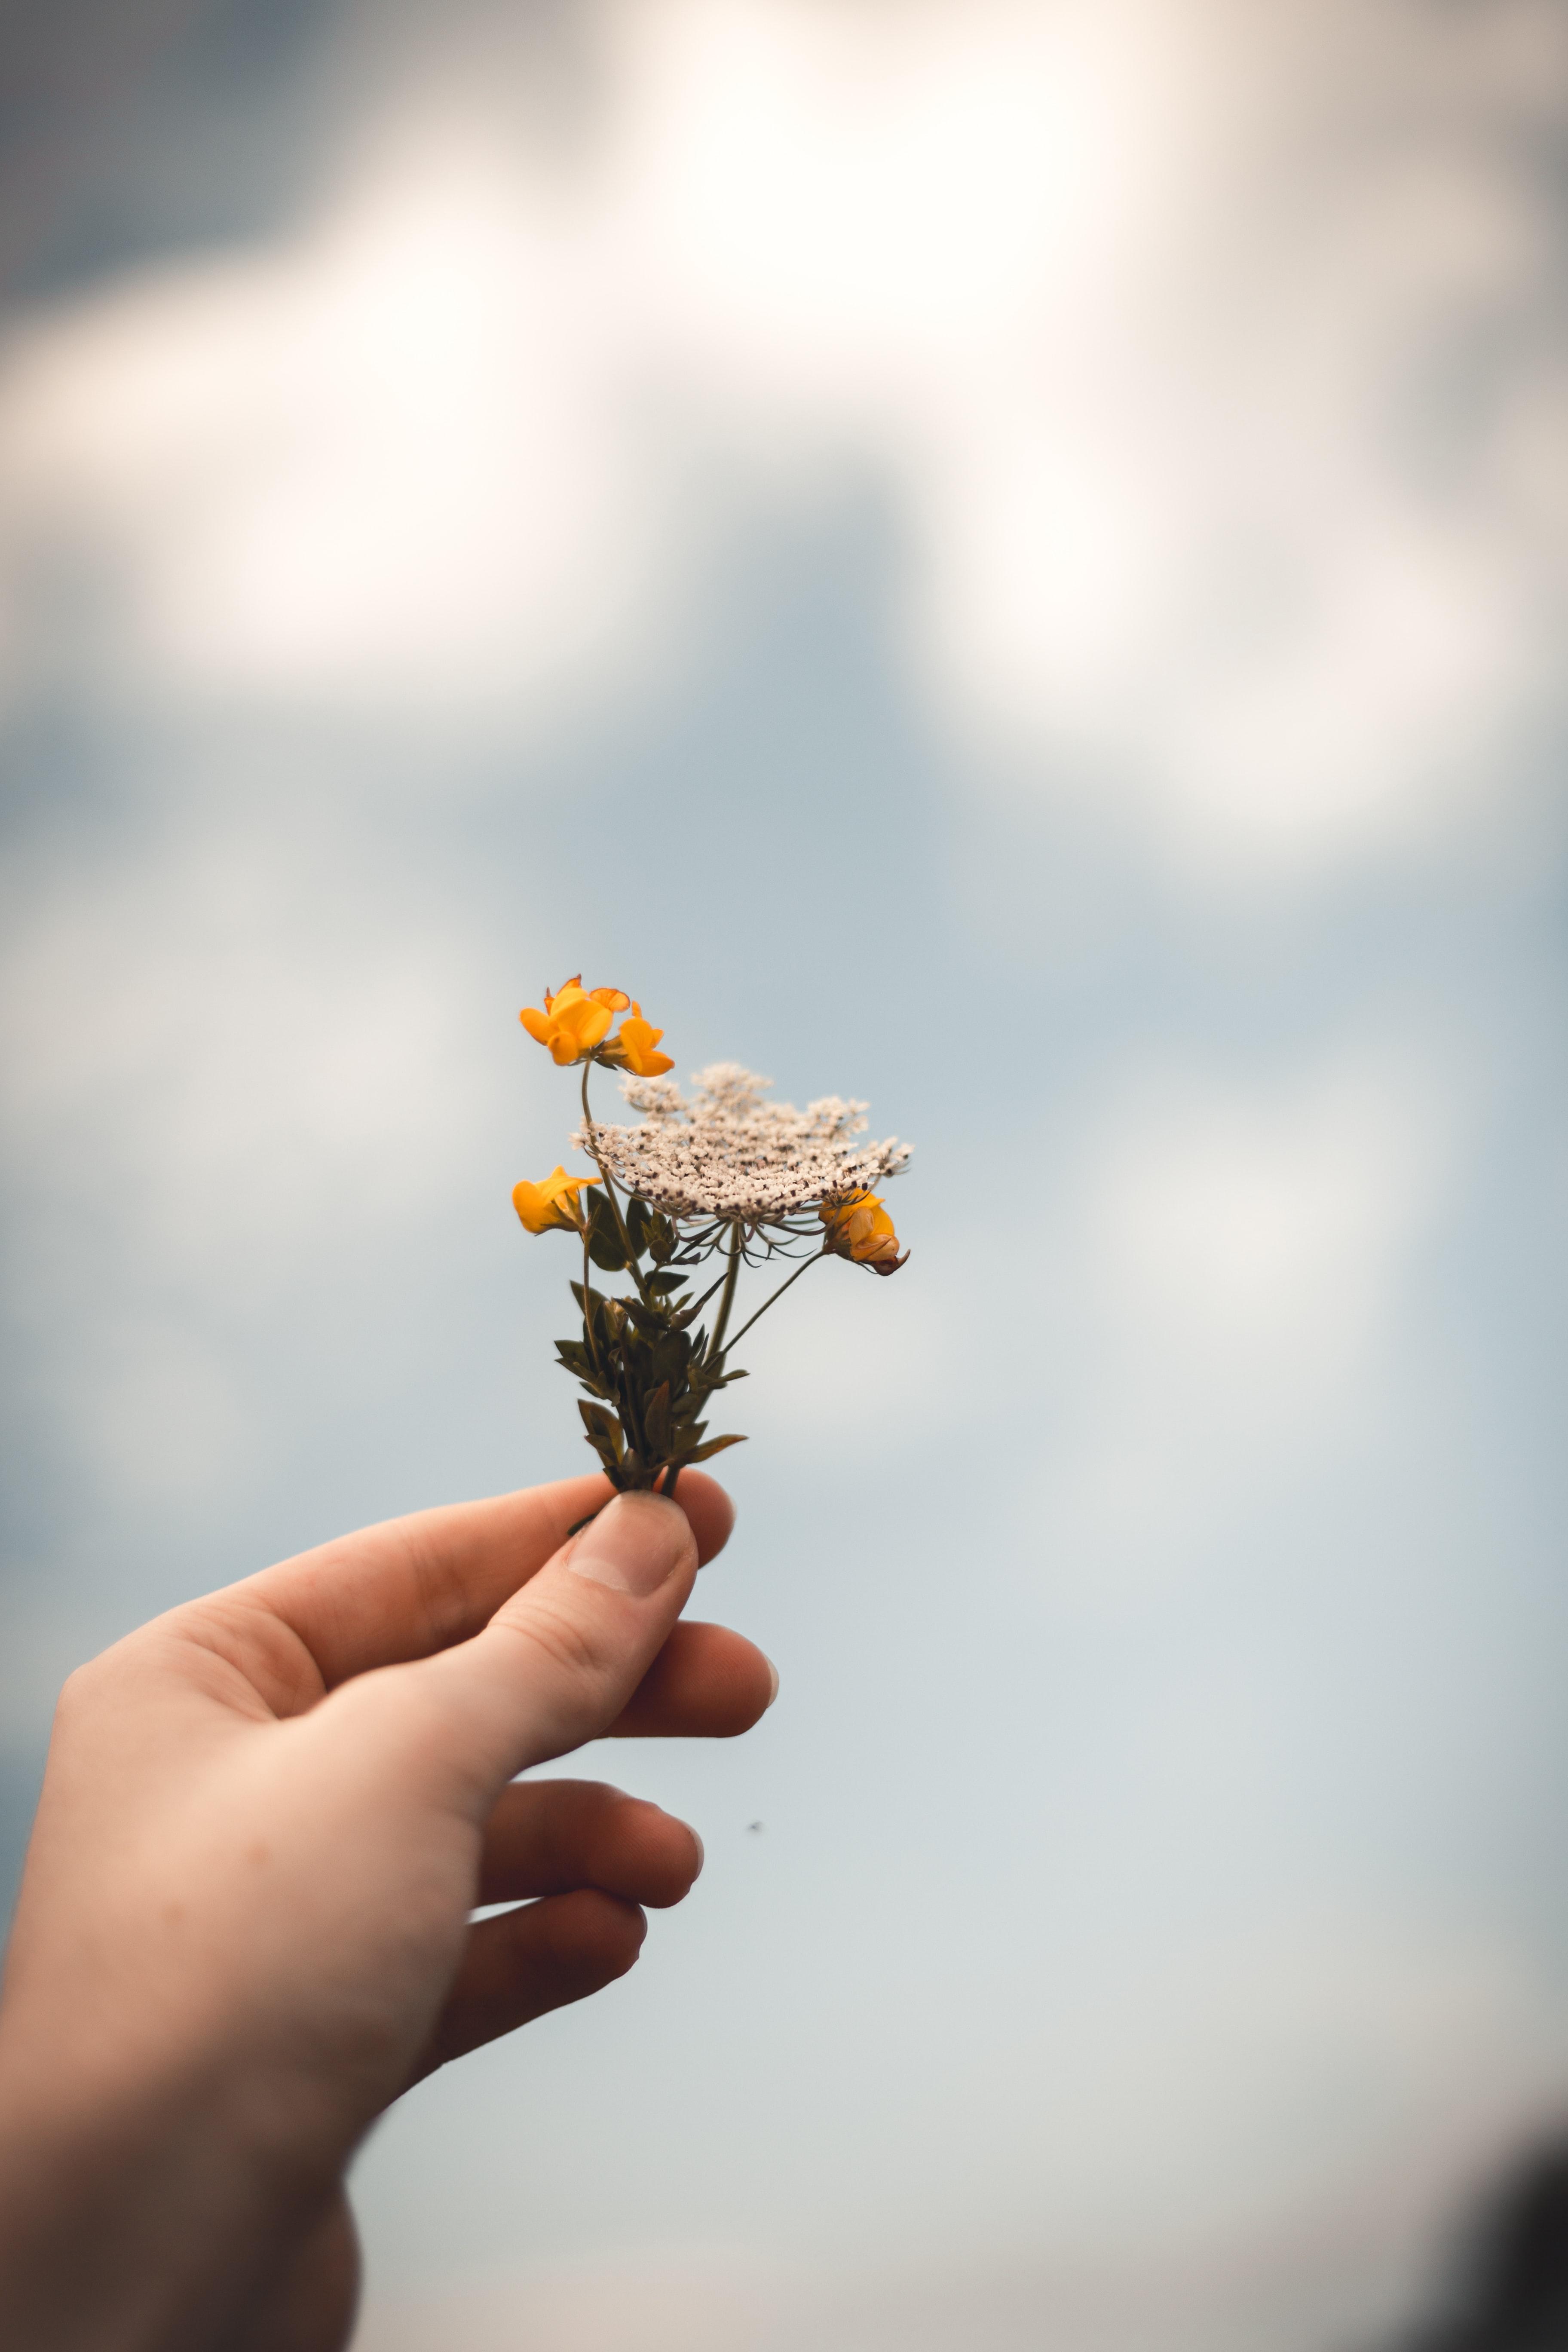 Flower - No image